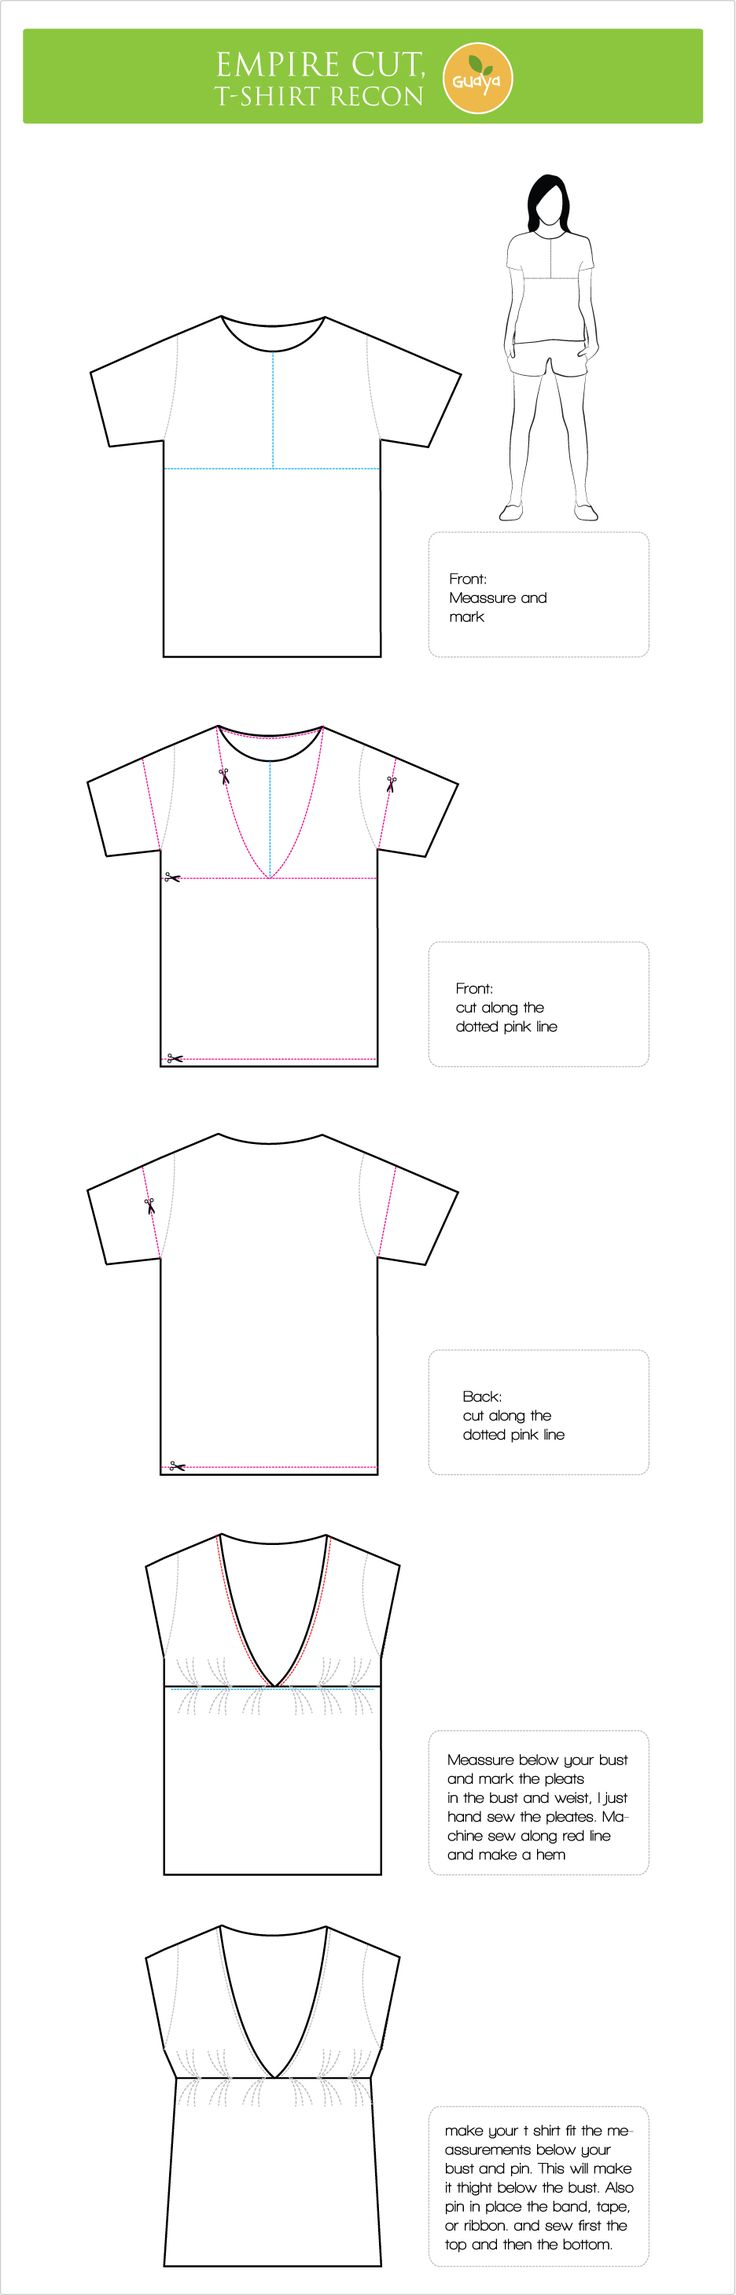 Empire cut blouse tshirt reconstruction